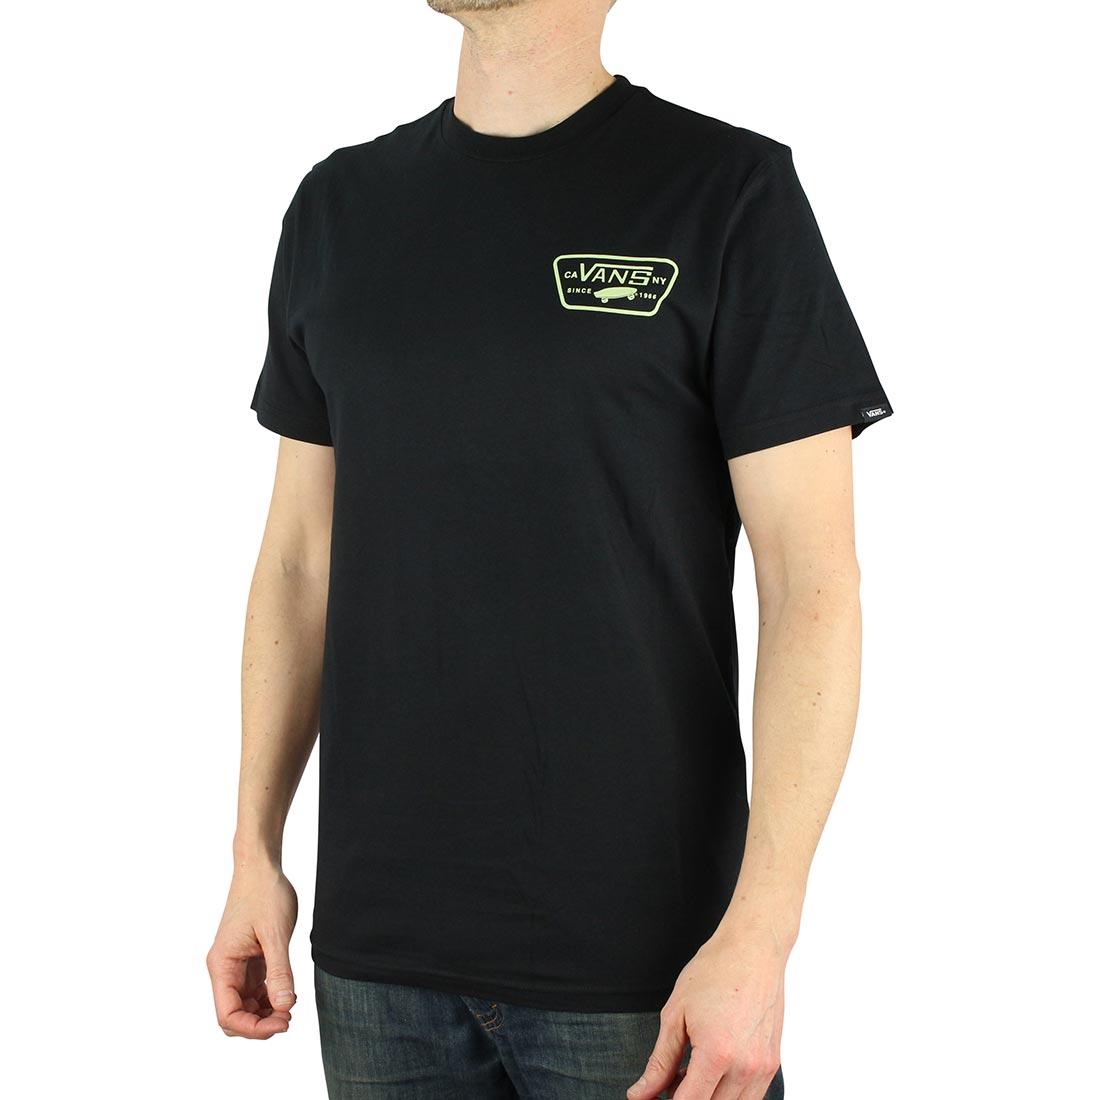 a4aaf115 Vans Full Patch Back S/S T-Shirt - Black Ambrosia